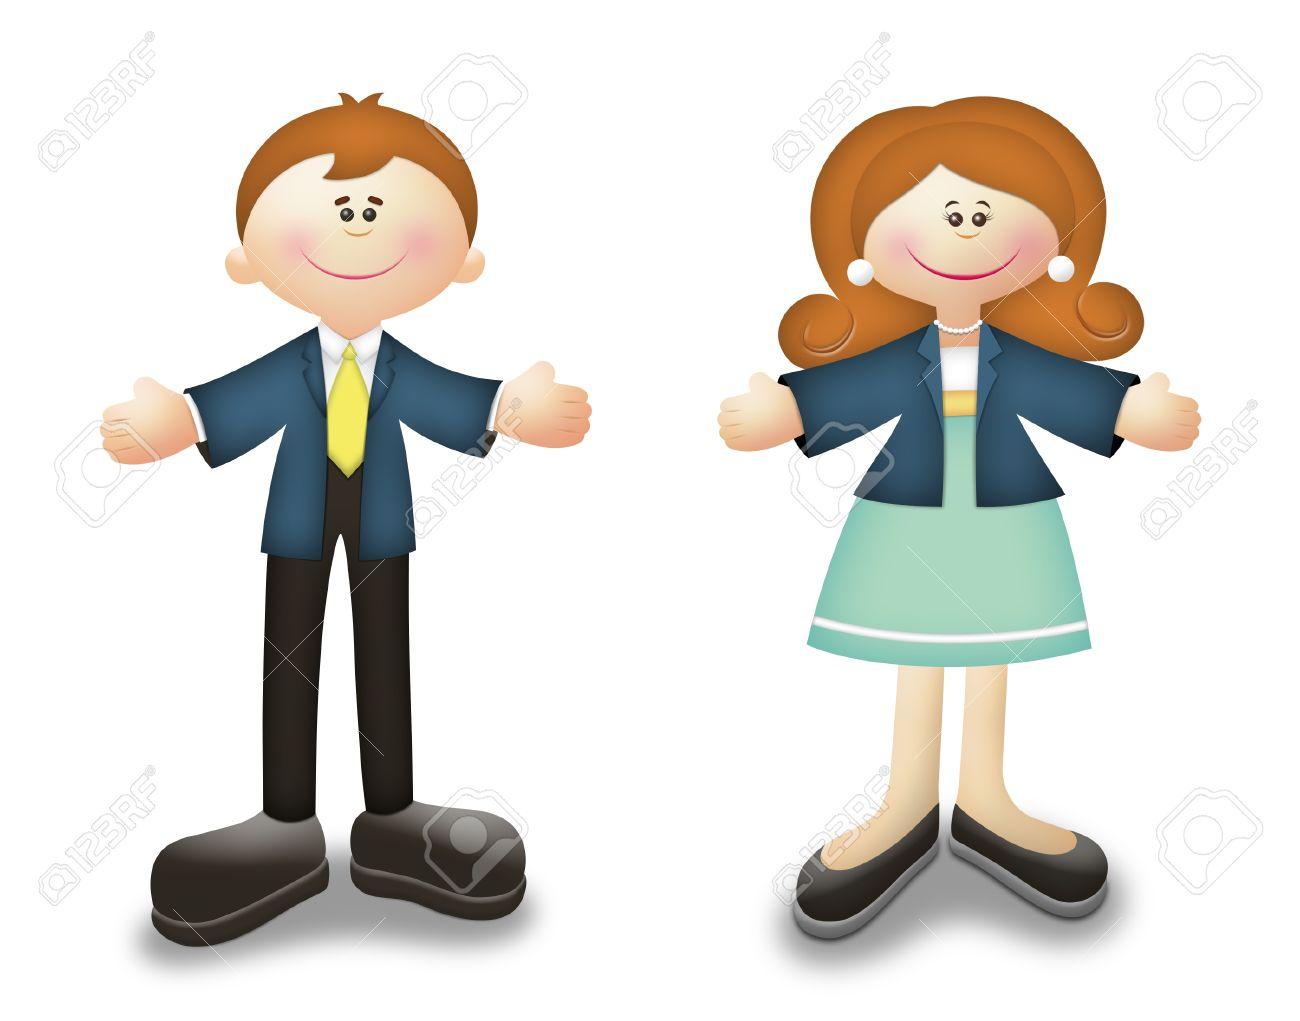 Cartoon career people in business suits. - 10395517